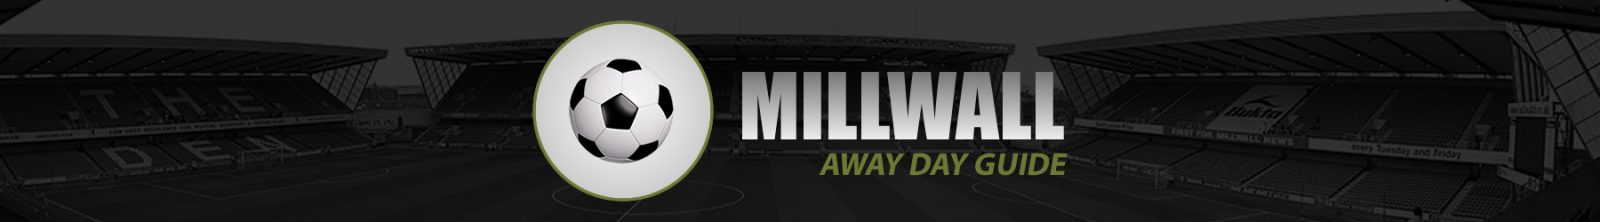 Millwall Away